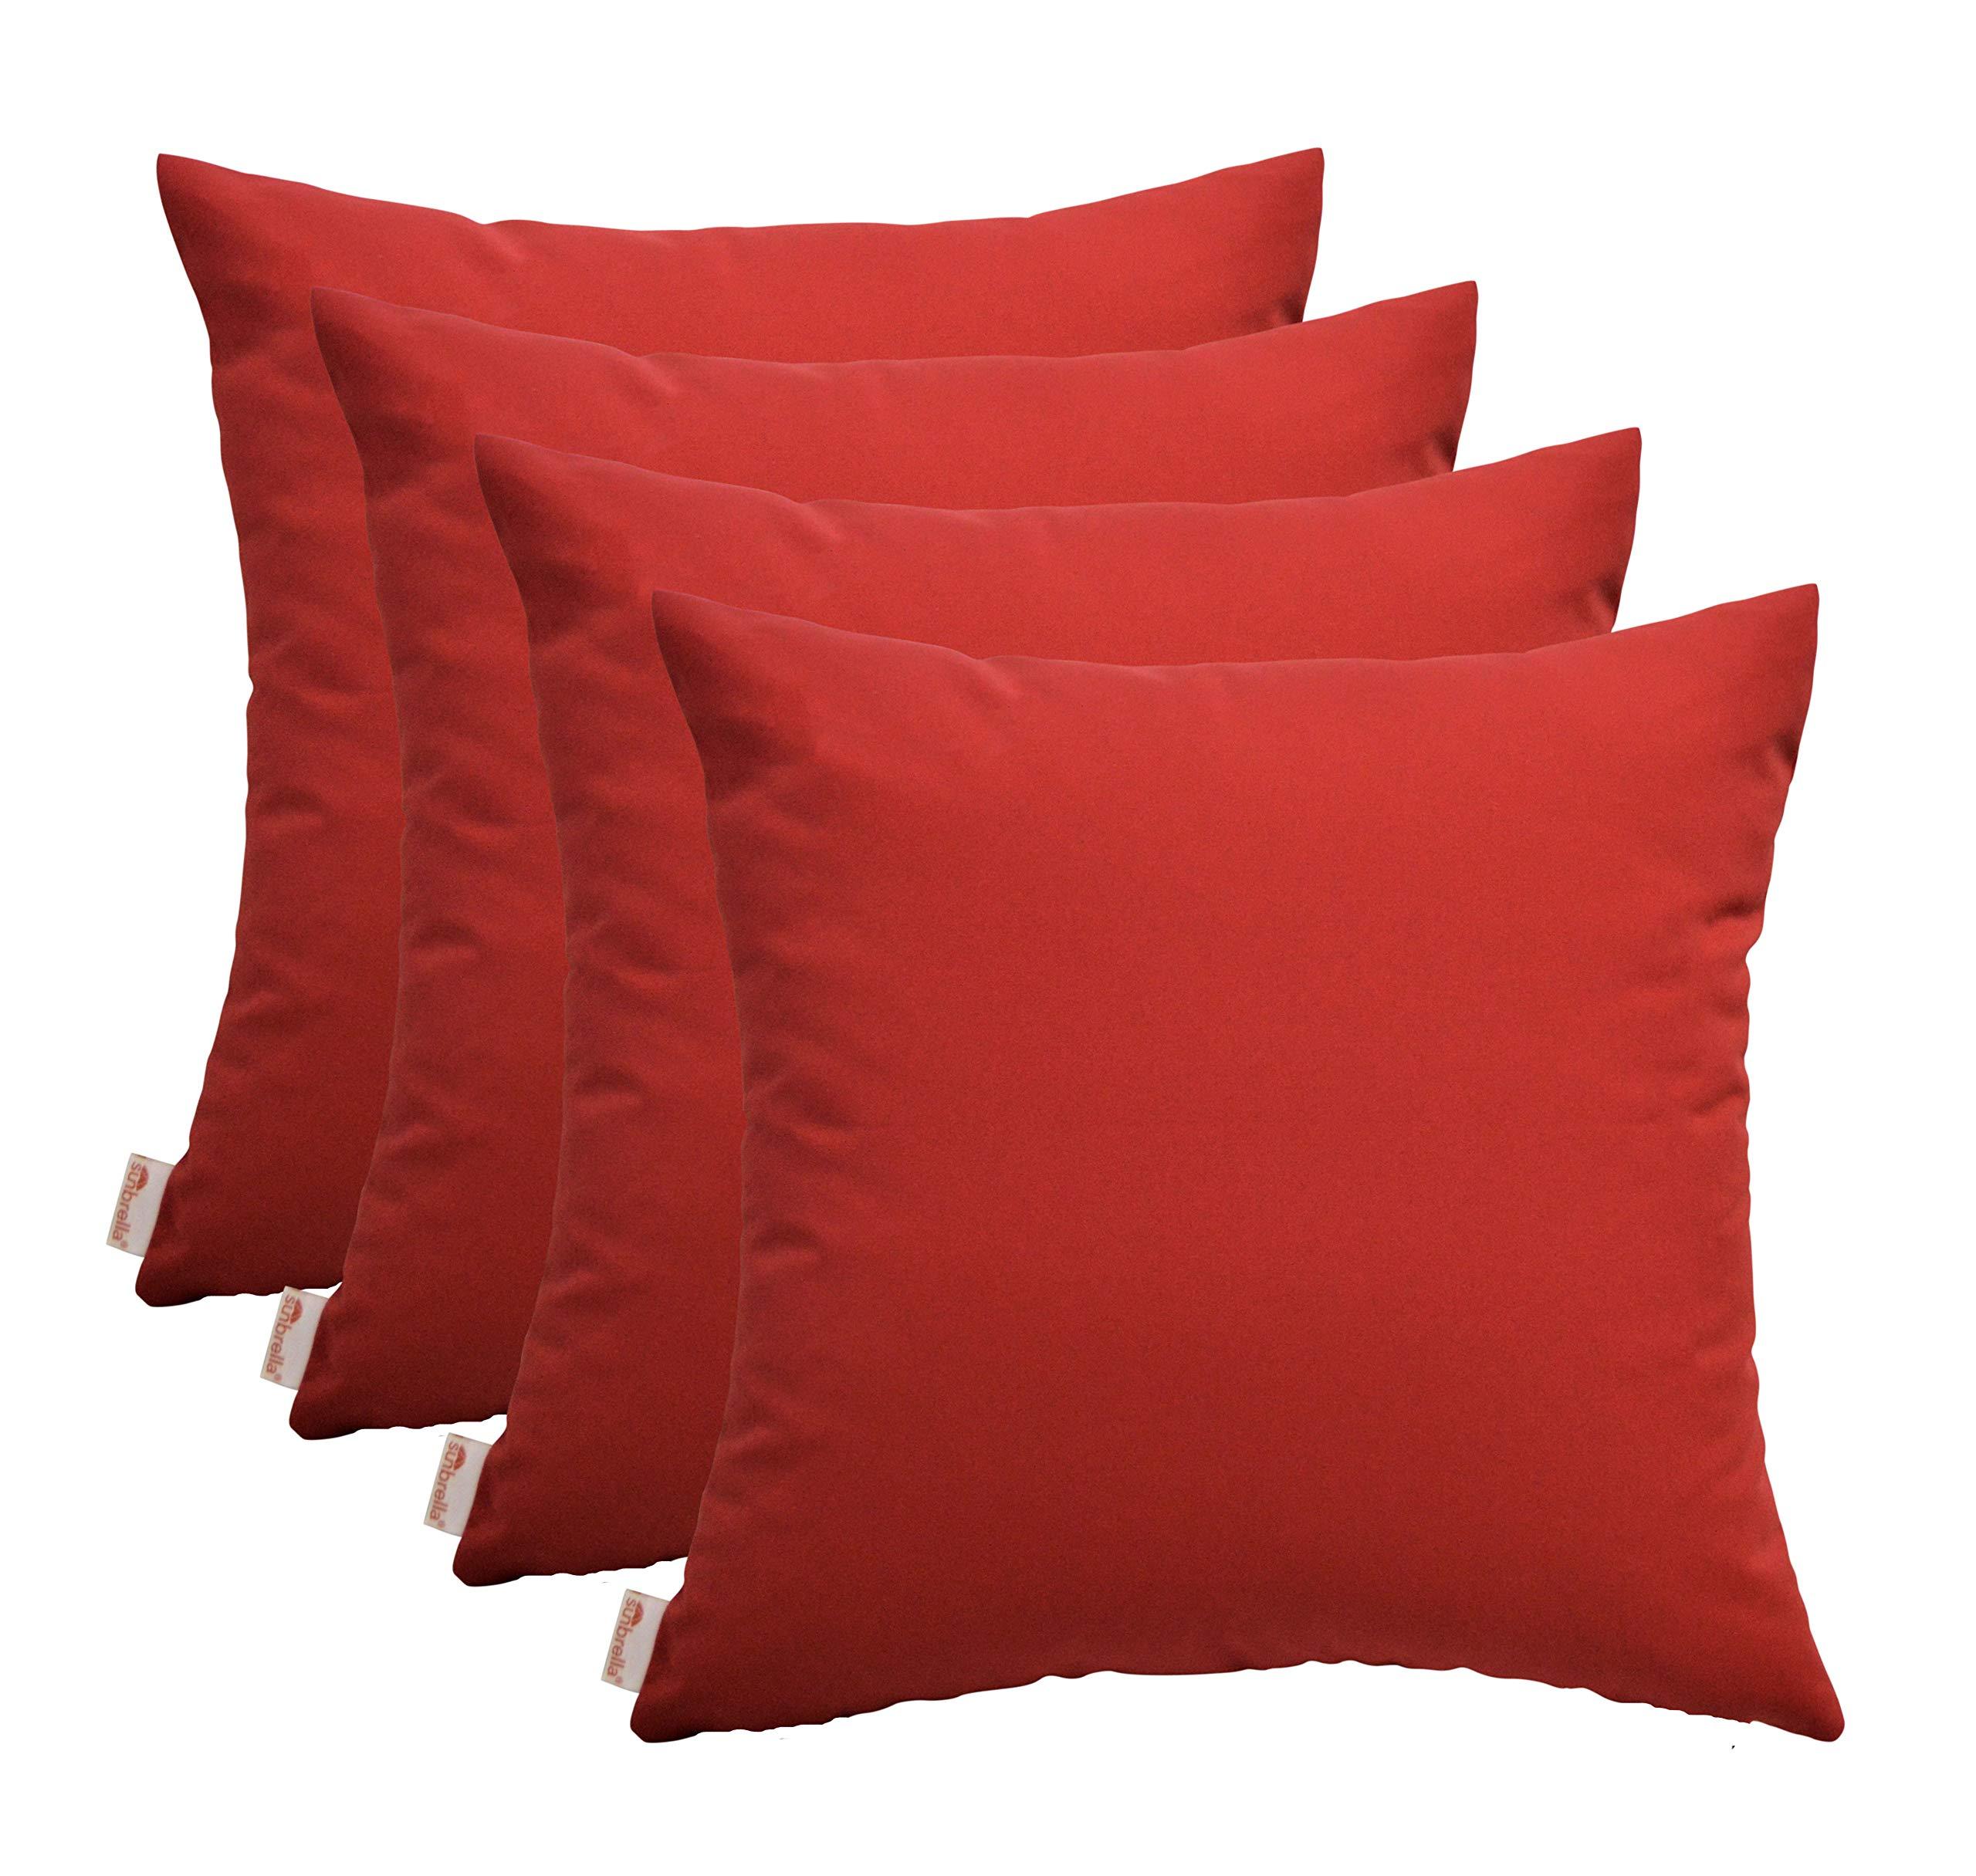 RSH Décor Set of 4 Indoor/Outdoor Square Throw Pillows Sunbrella Canvas Jockey Red (17'' x 17'')